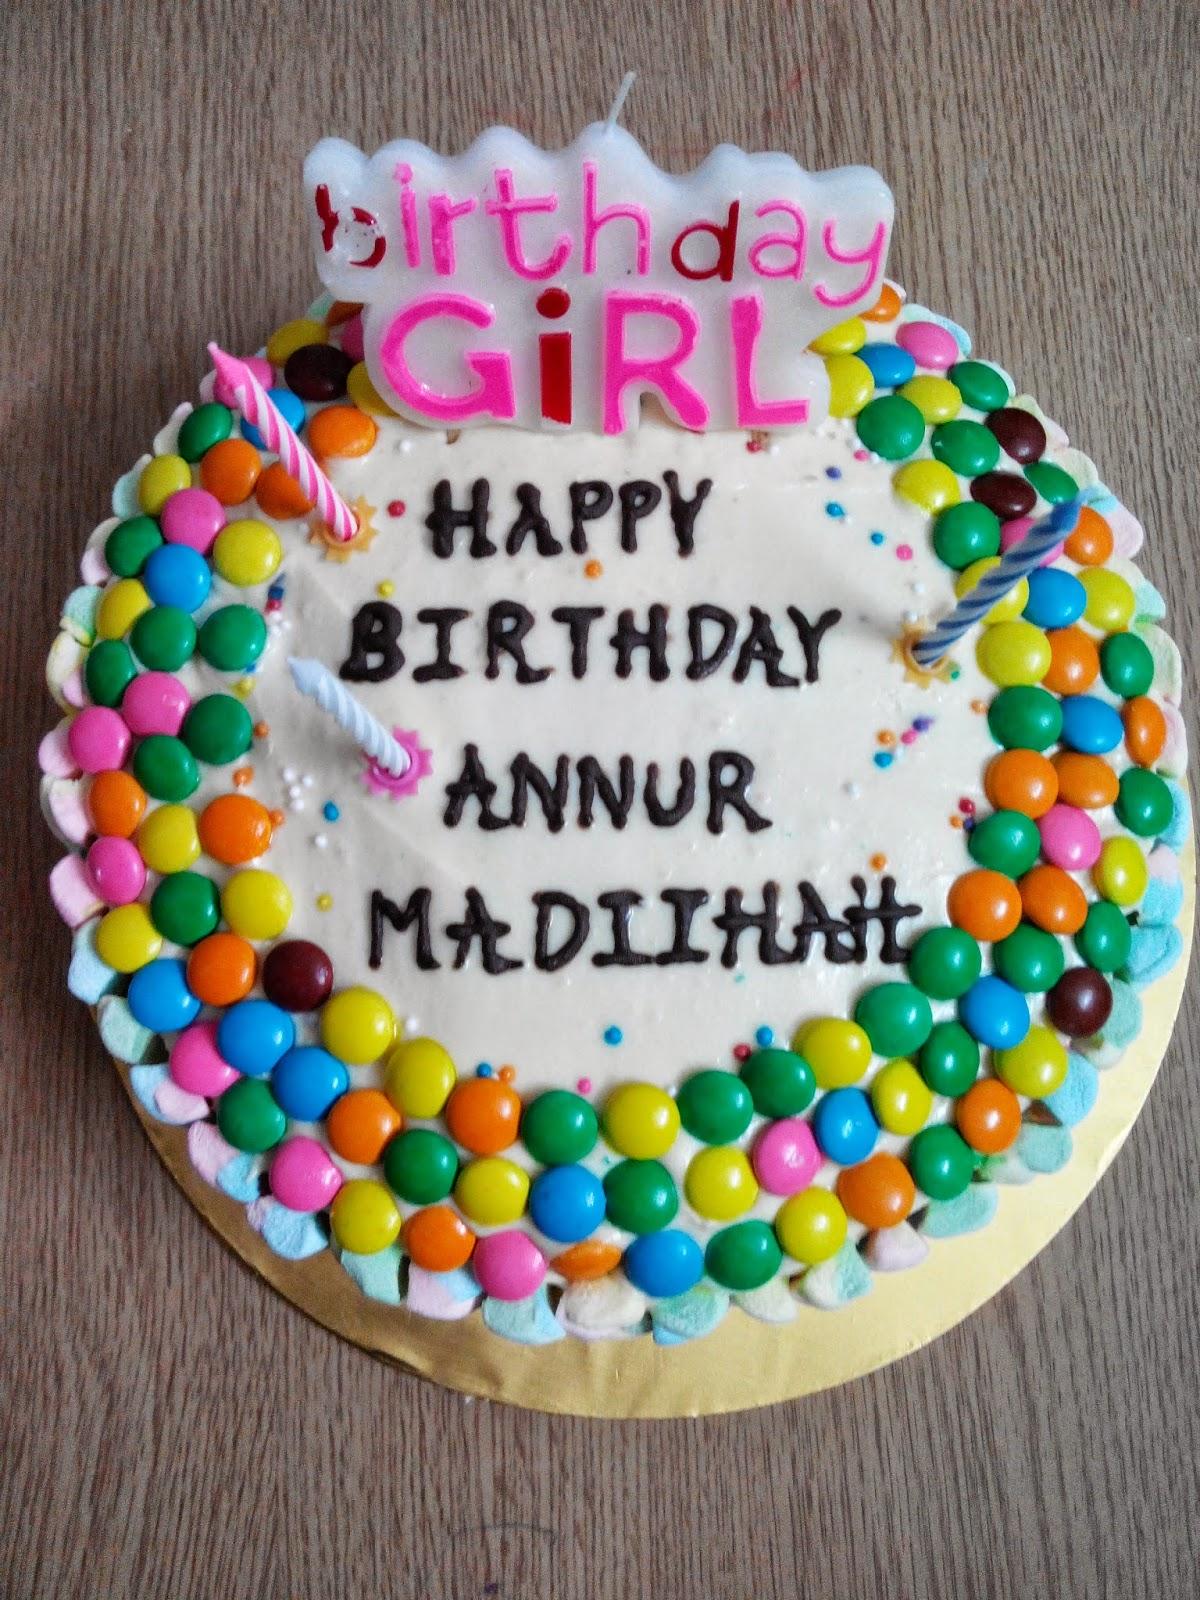 Annur Aishukri 3rd Happy Birhtday Annur Madiihah